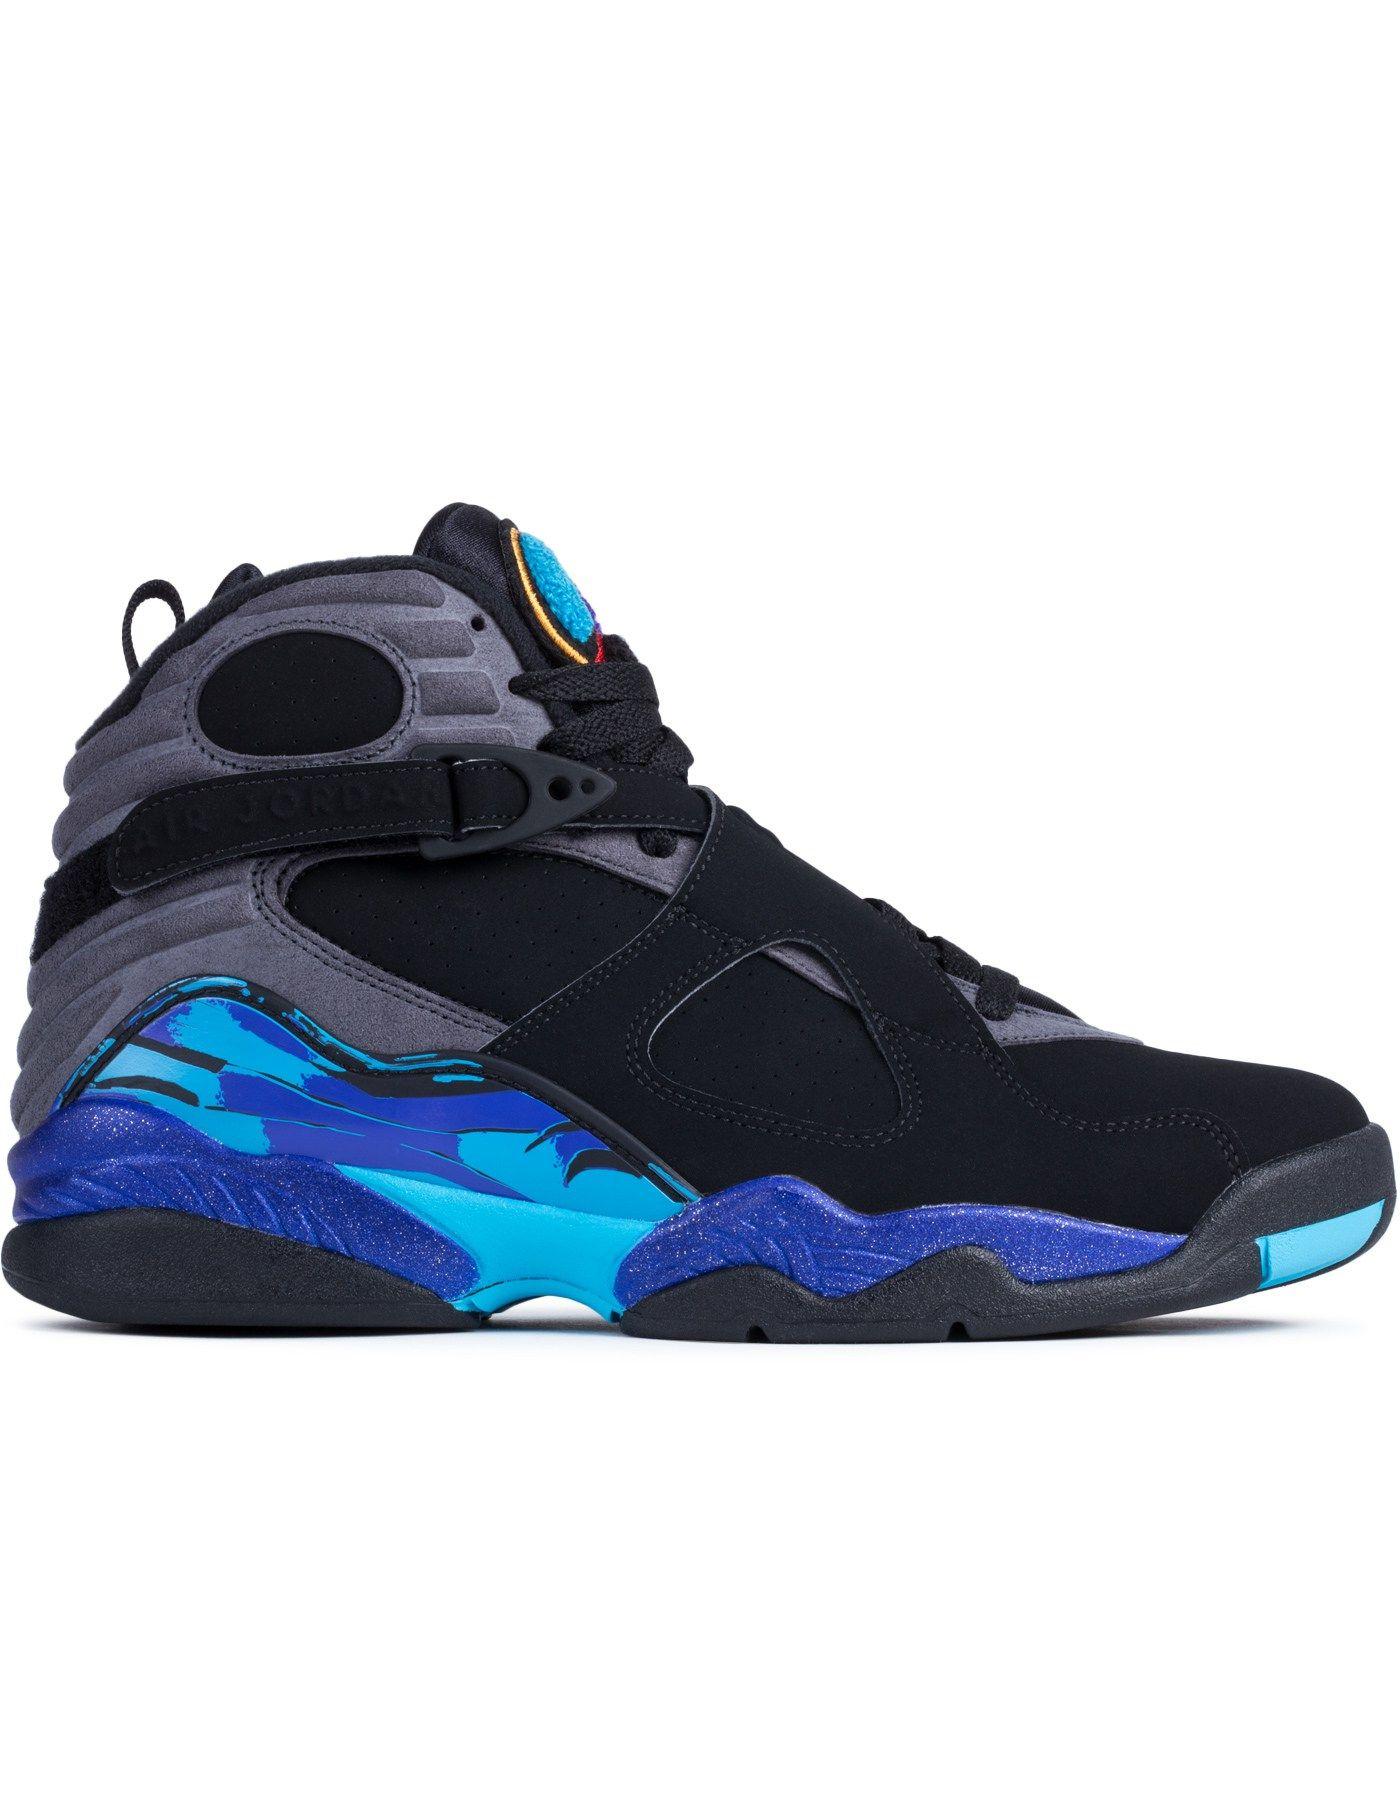 4b83c1c8c70 Nike